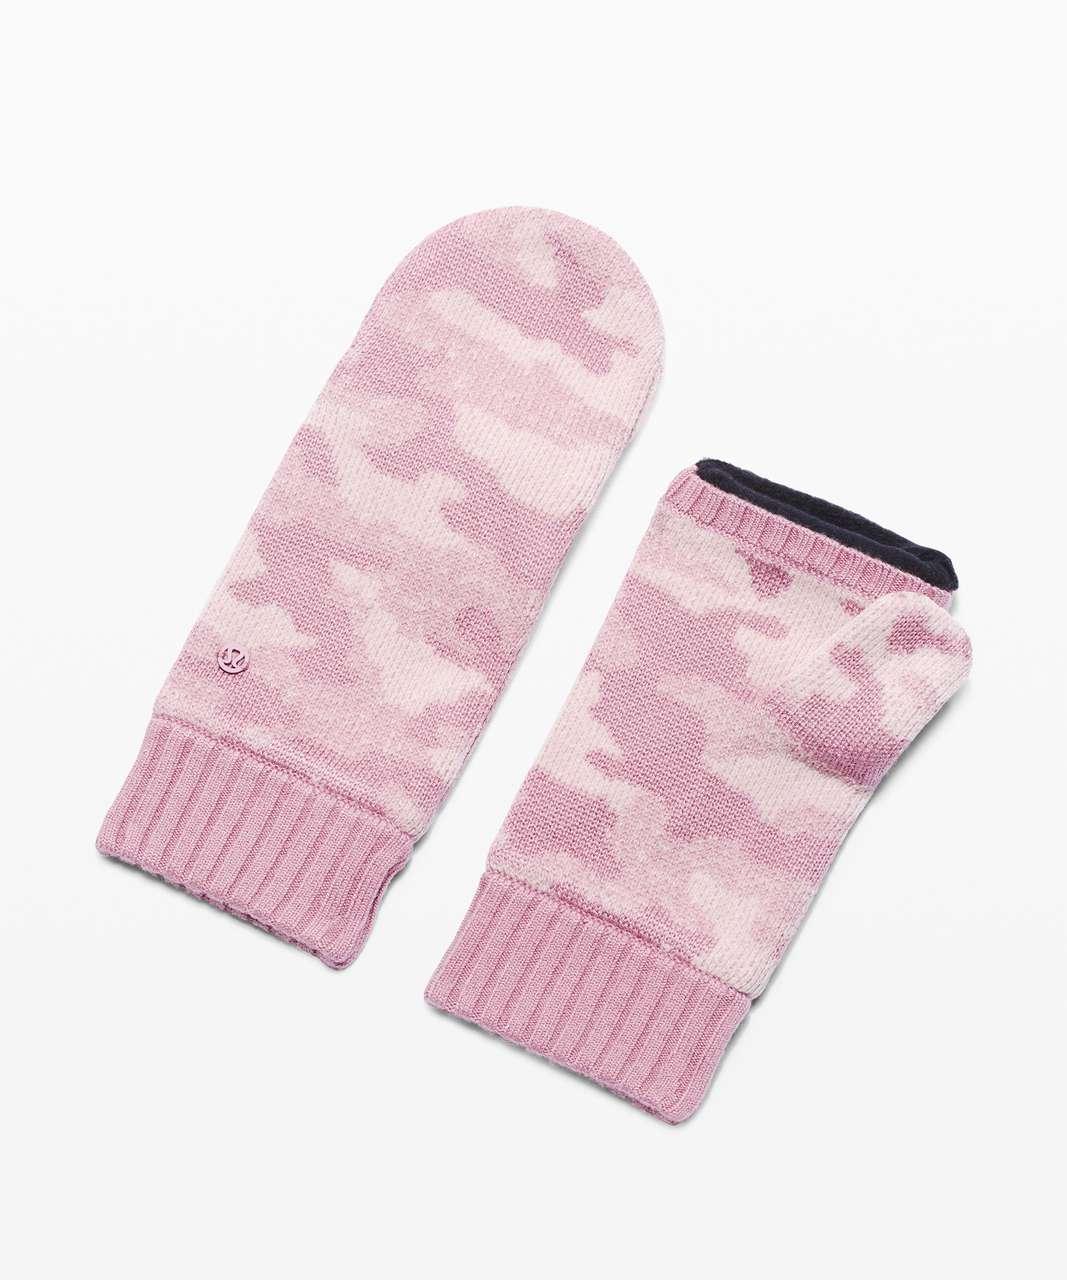 Lululemon Room for Warmth Mitten - Pink Taupe / Porcelain Pink